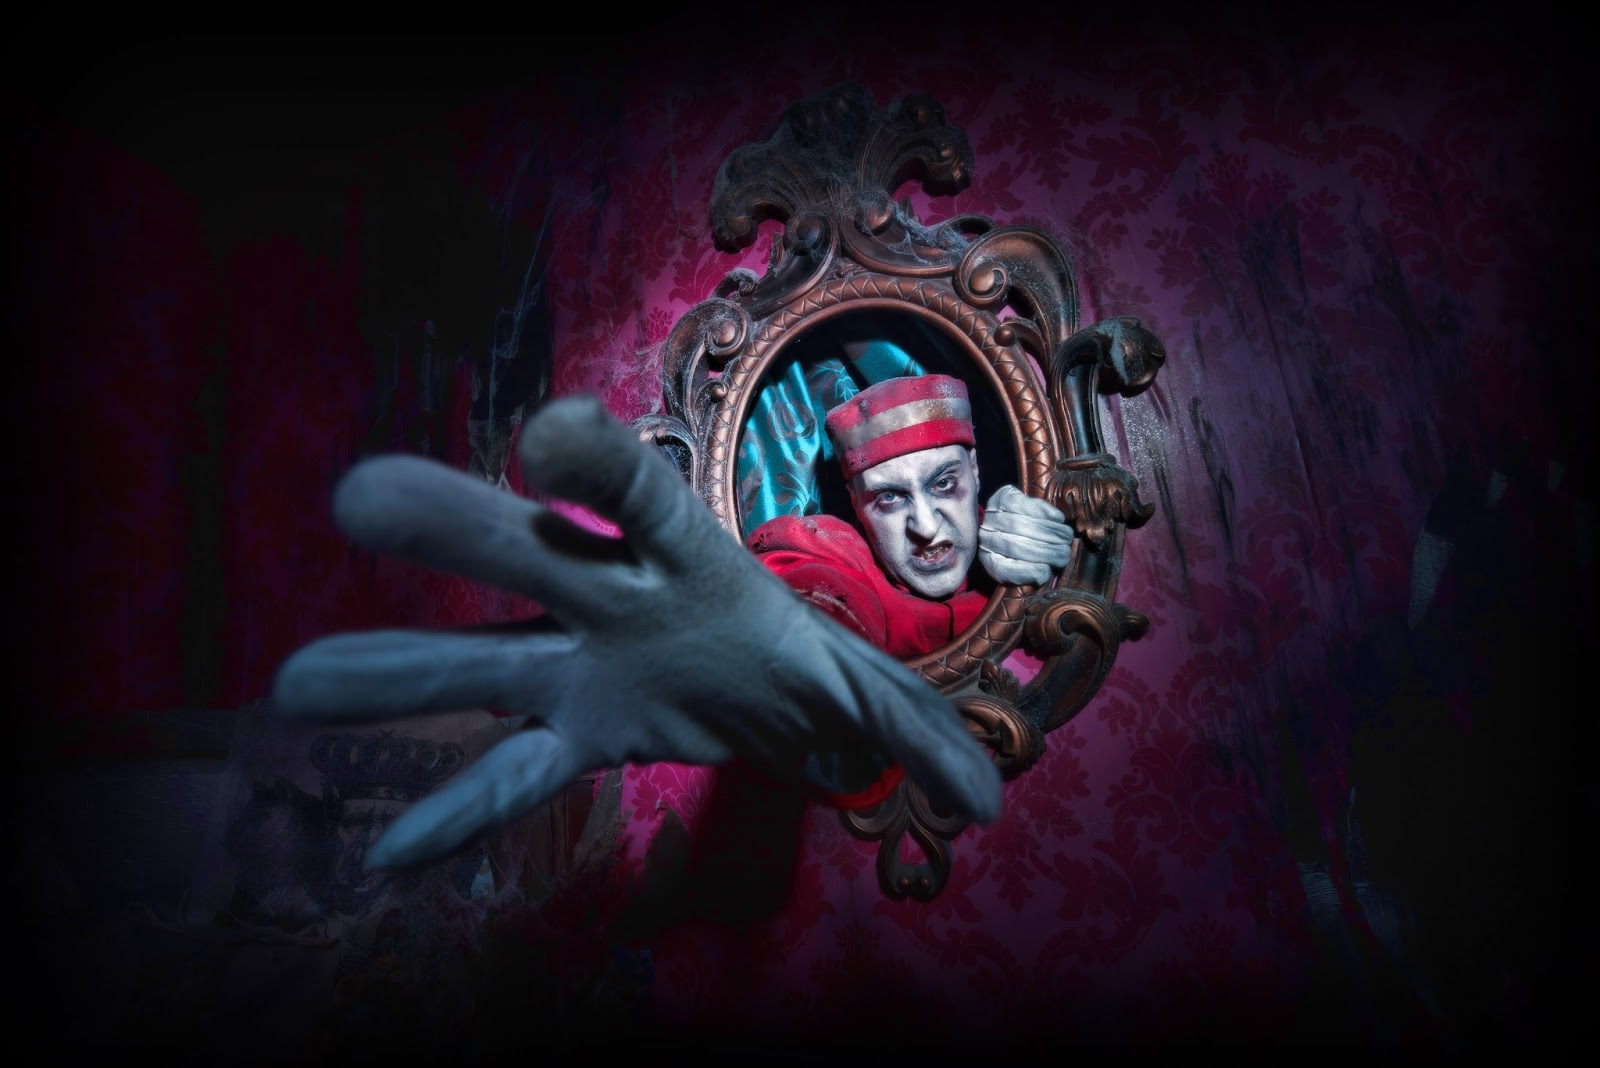 Formidable Joy | UK Fashion, Beauty & Lifestyle Blog | Halloween | UK Fright Nights | Thorpe Park | Fright Nights | Mead Open Farm | The Howl Scream Park | Alton Towers | Scarefest | Dr Frights Halloween Nights | Chessington | Howloween | Screamland Margate | Zed Events